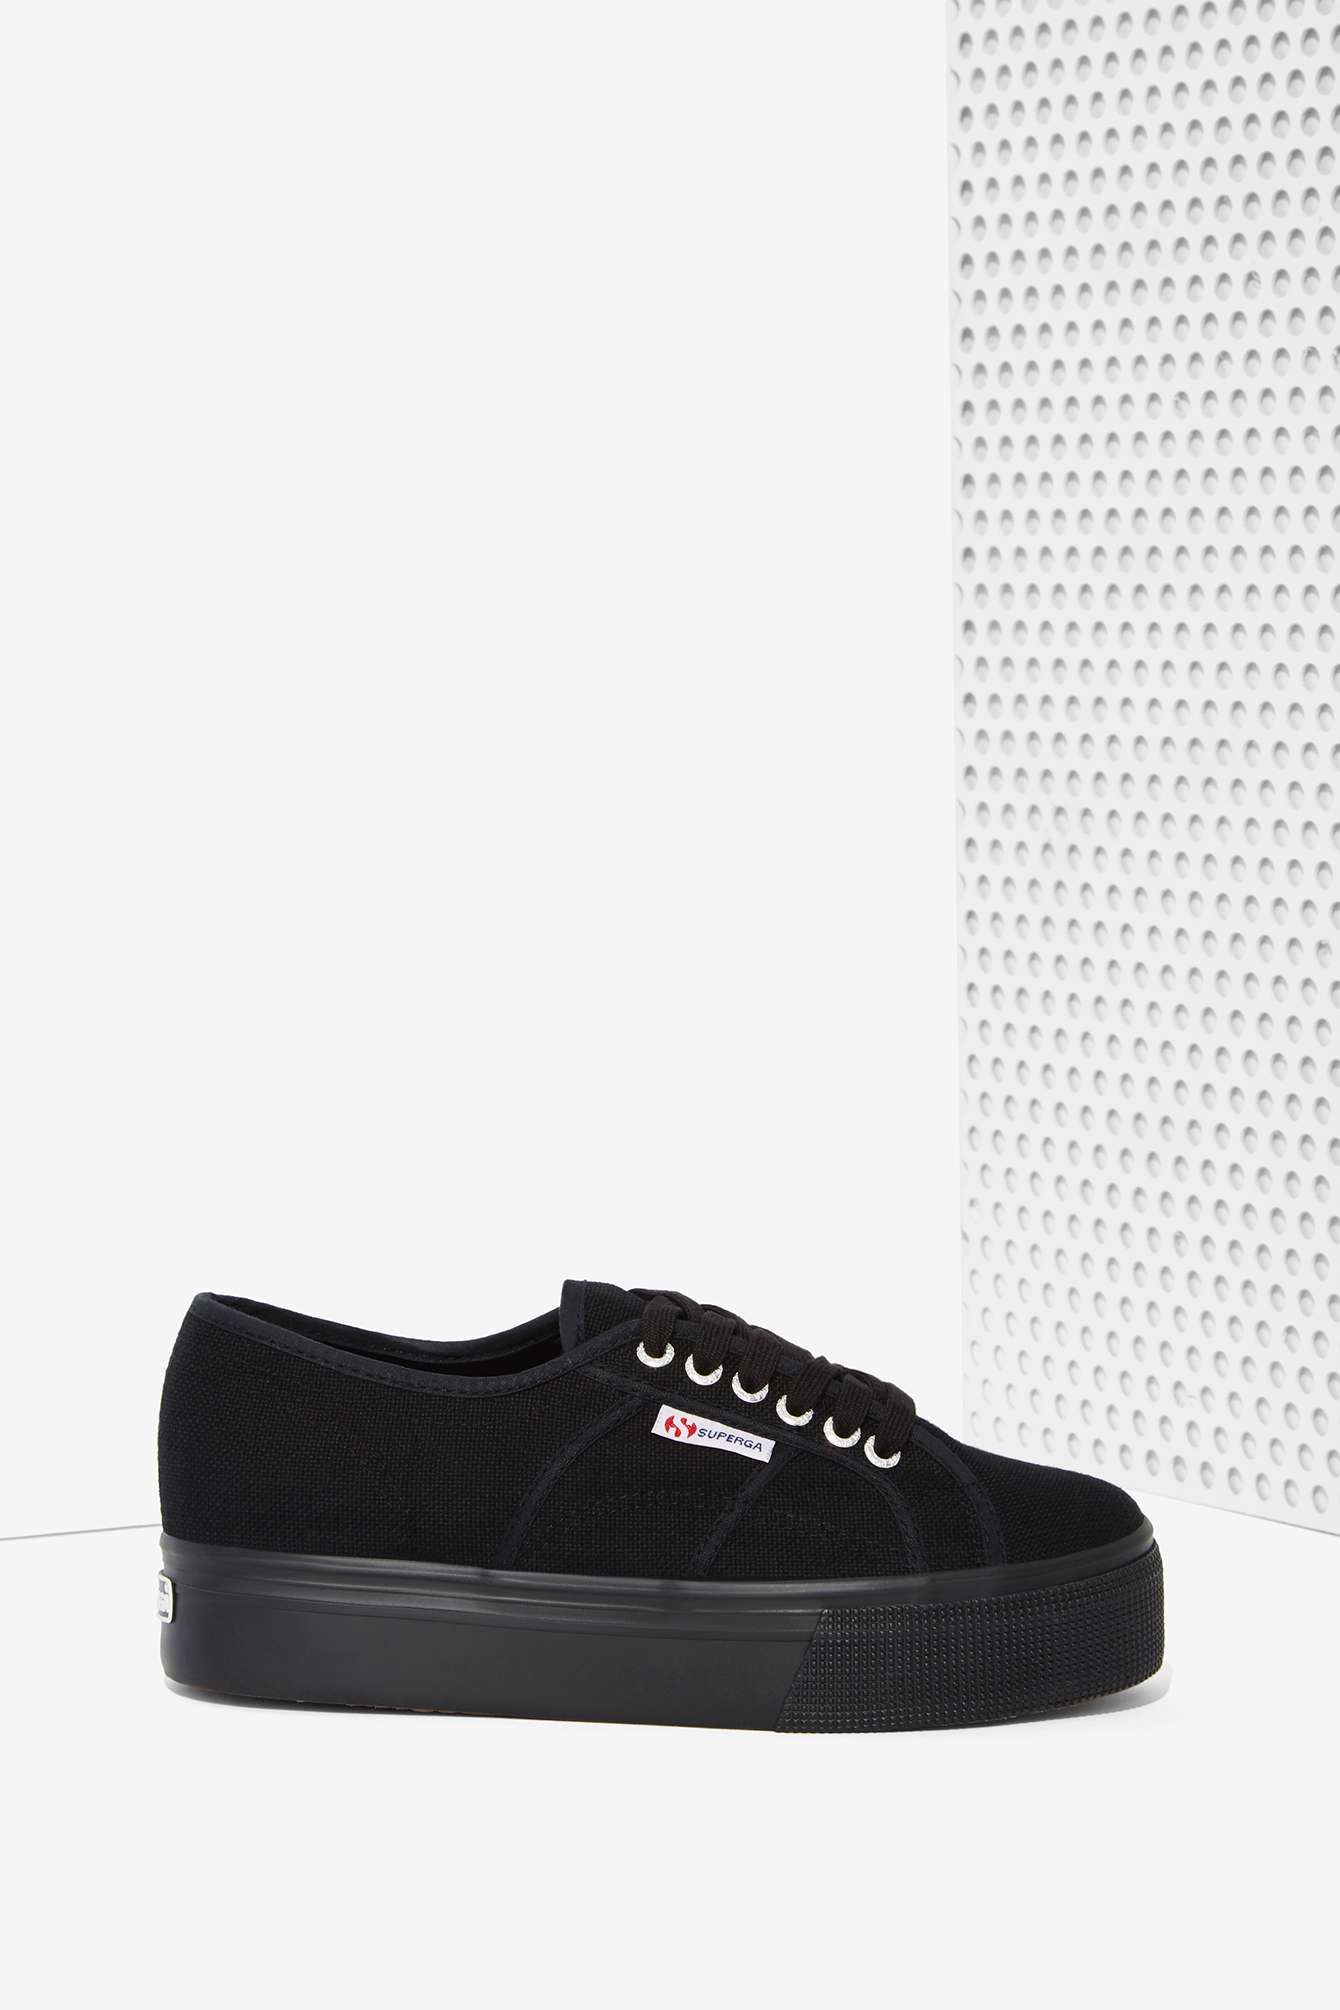 Superga: Superga Up And Down Platform Sneaker In Black